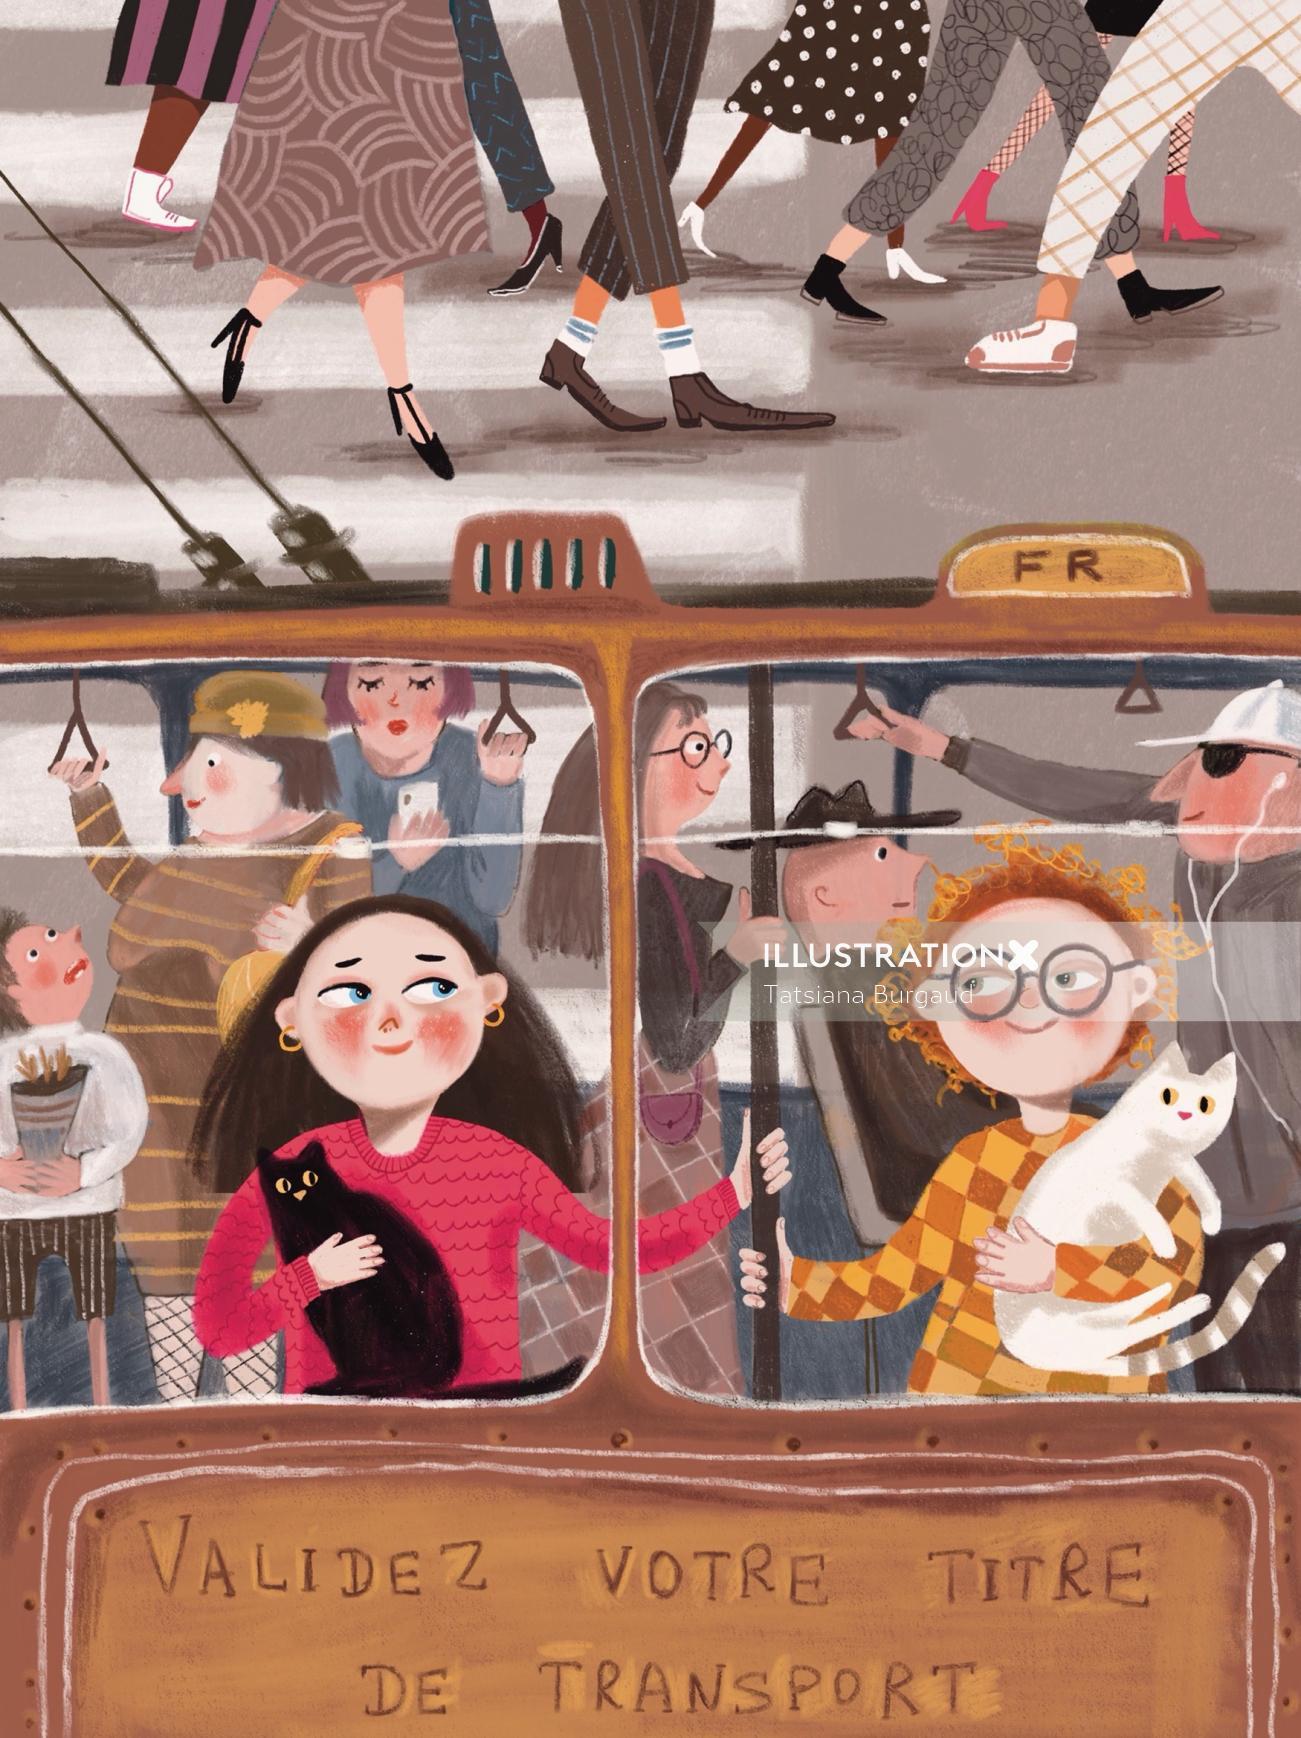 cat, trolley, city, crowd, journey